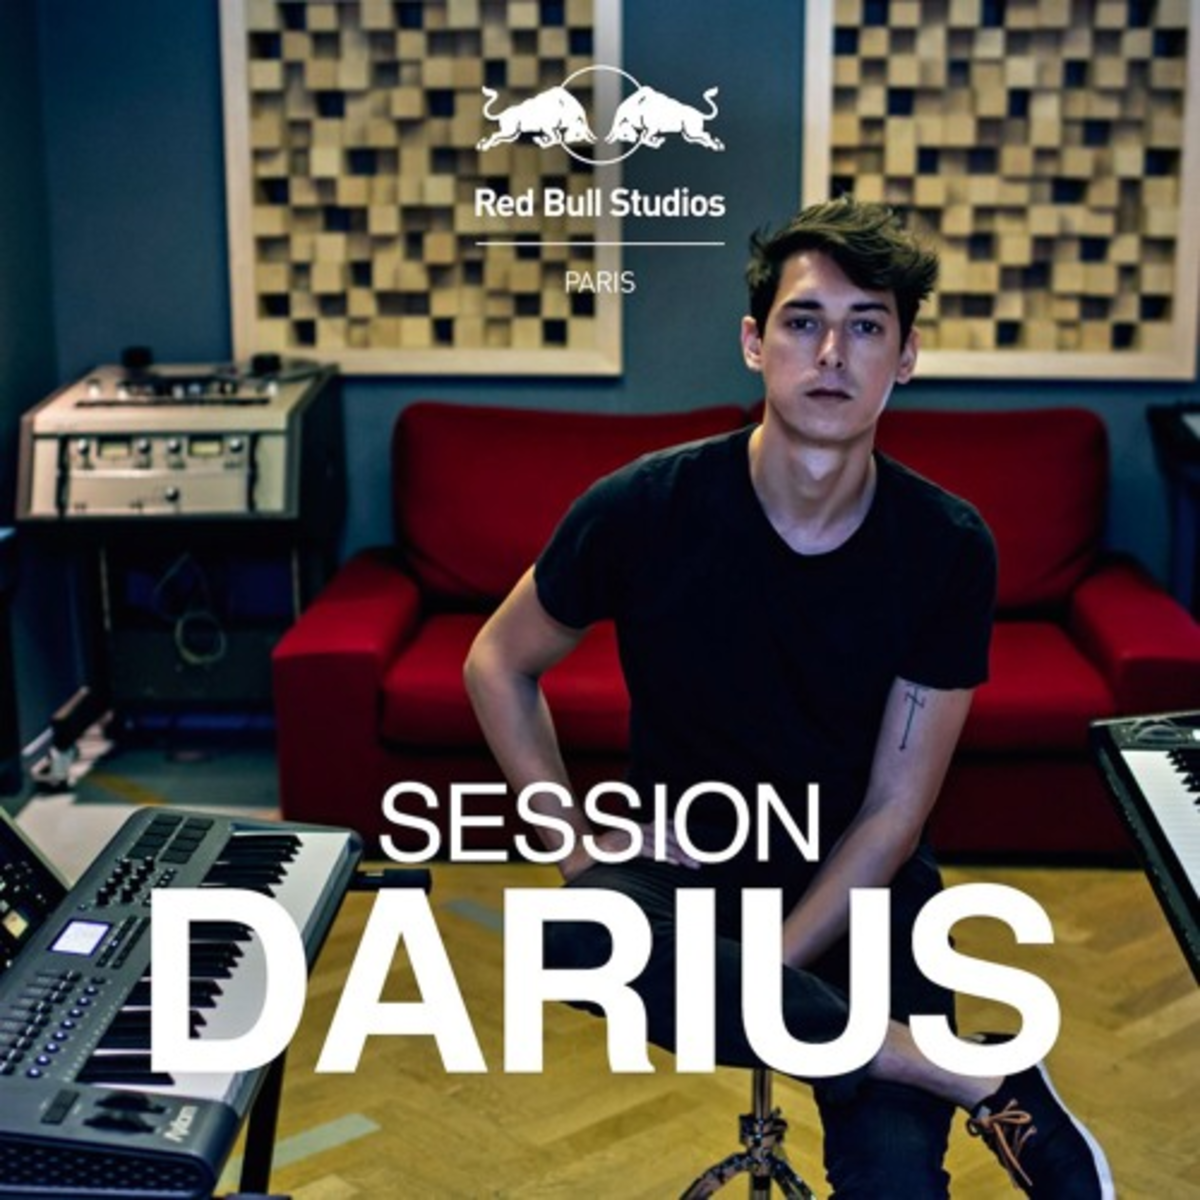 Darius Red Bull Studios Paris